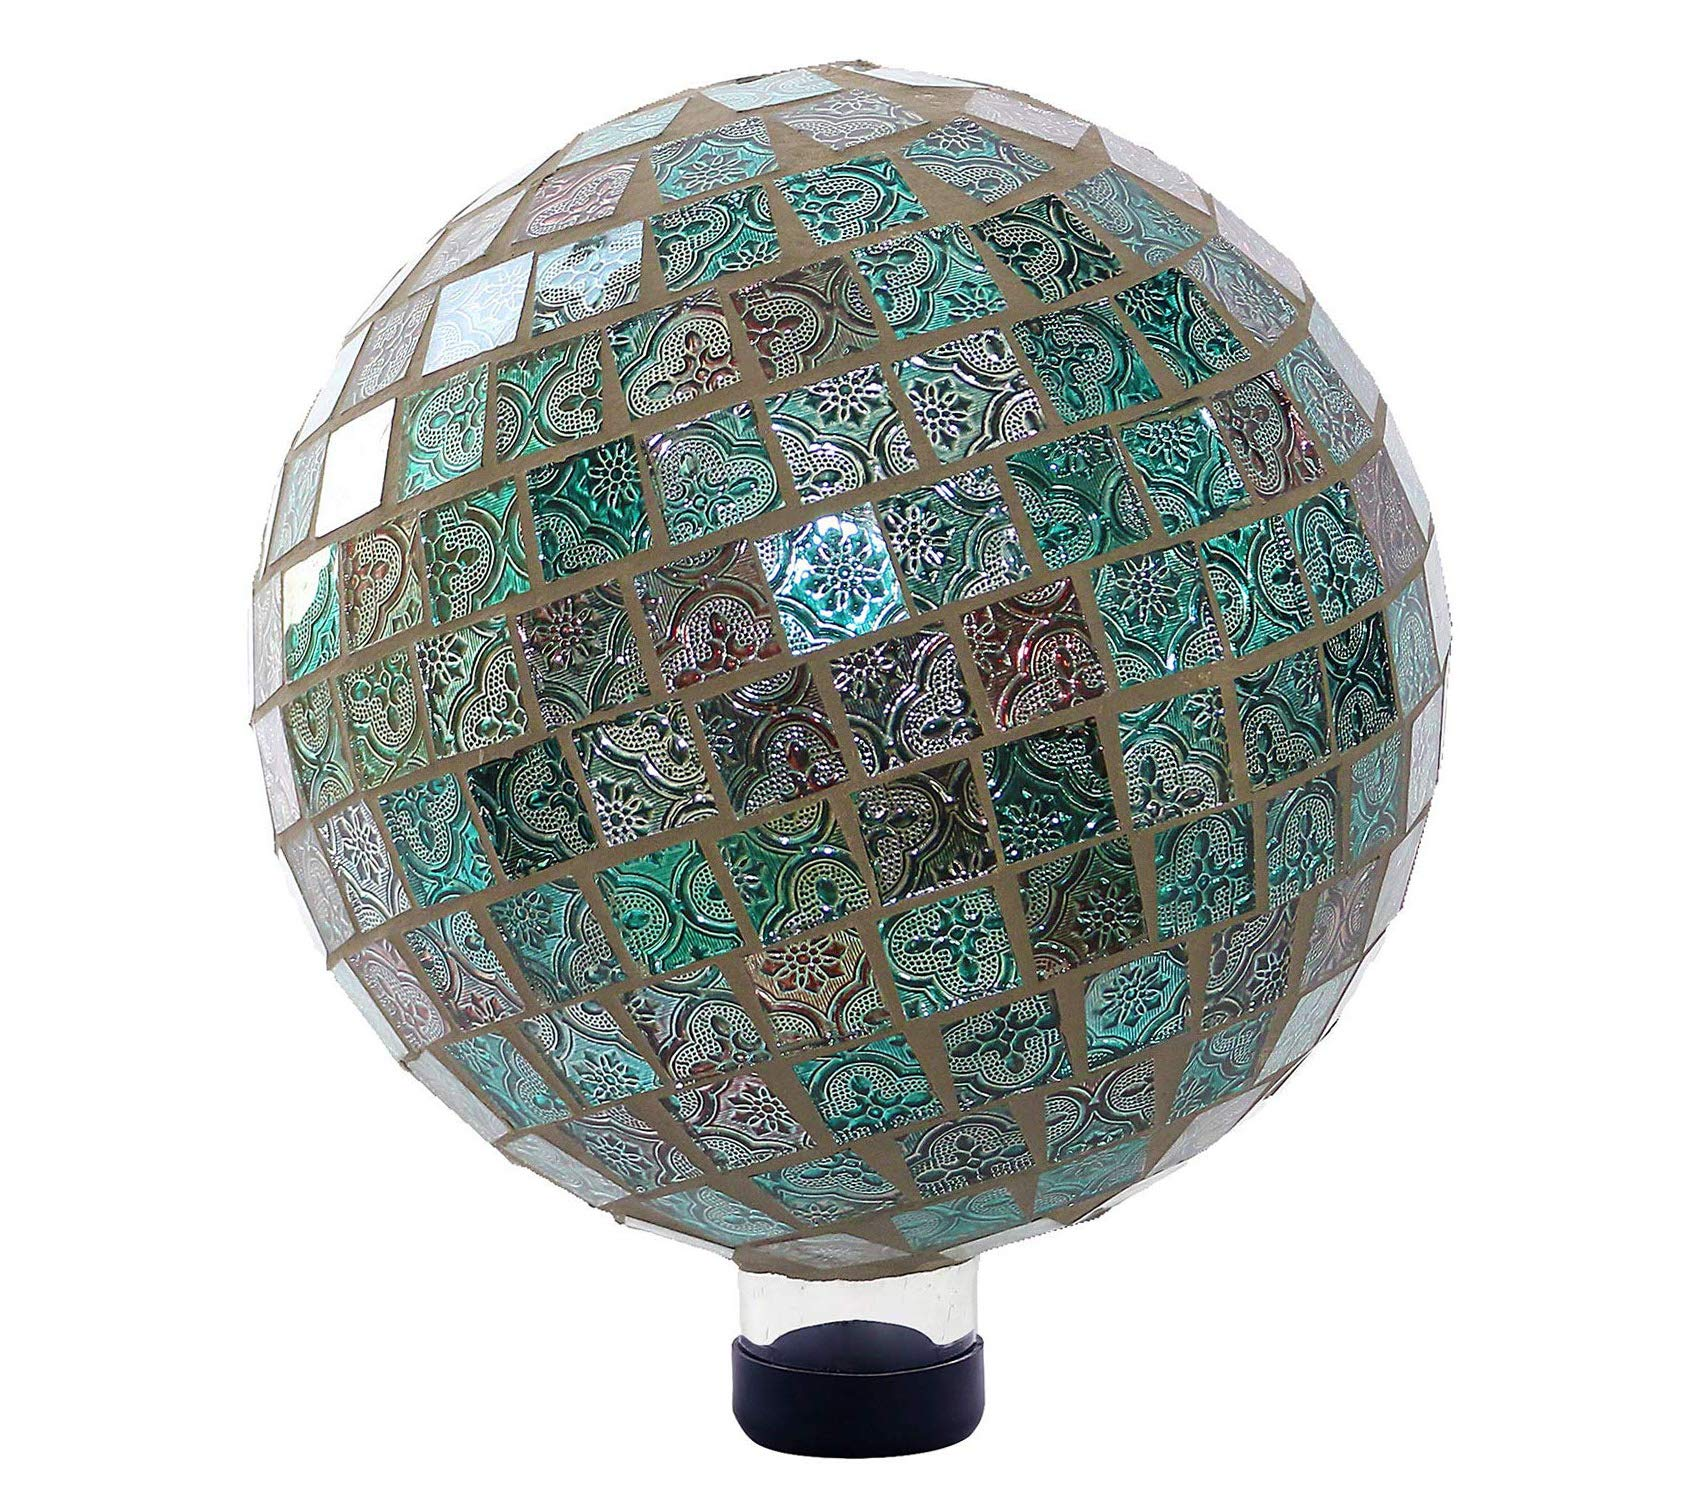 Outdoor Garden Backyard Décor Mosaic Gazing Globe, 11 Inch Tall Turquoise by Garden Décor (Image #1)